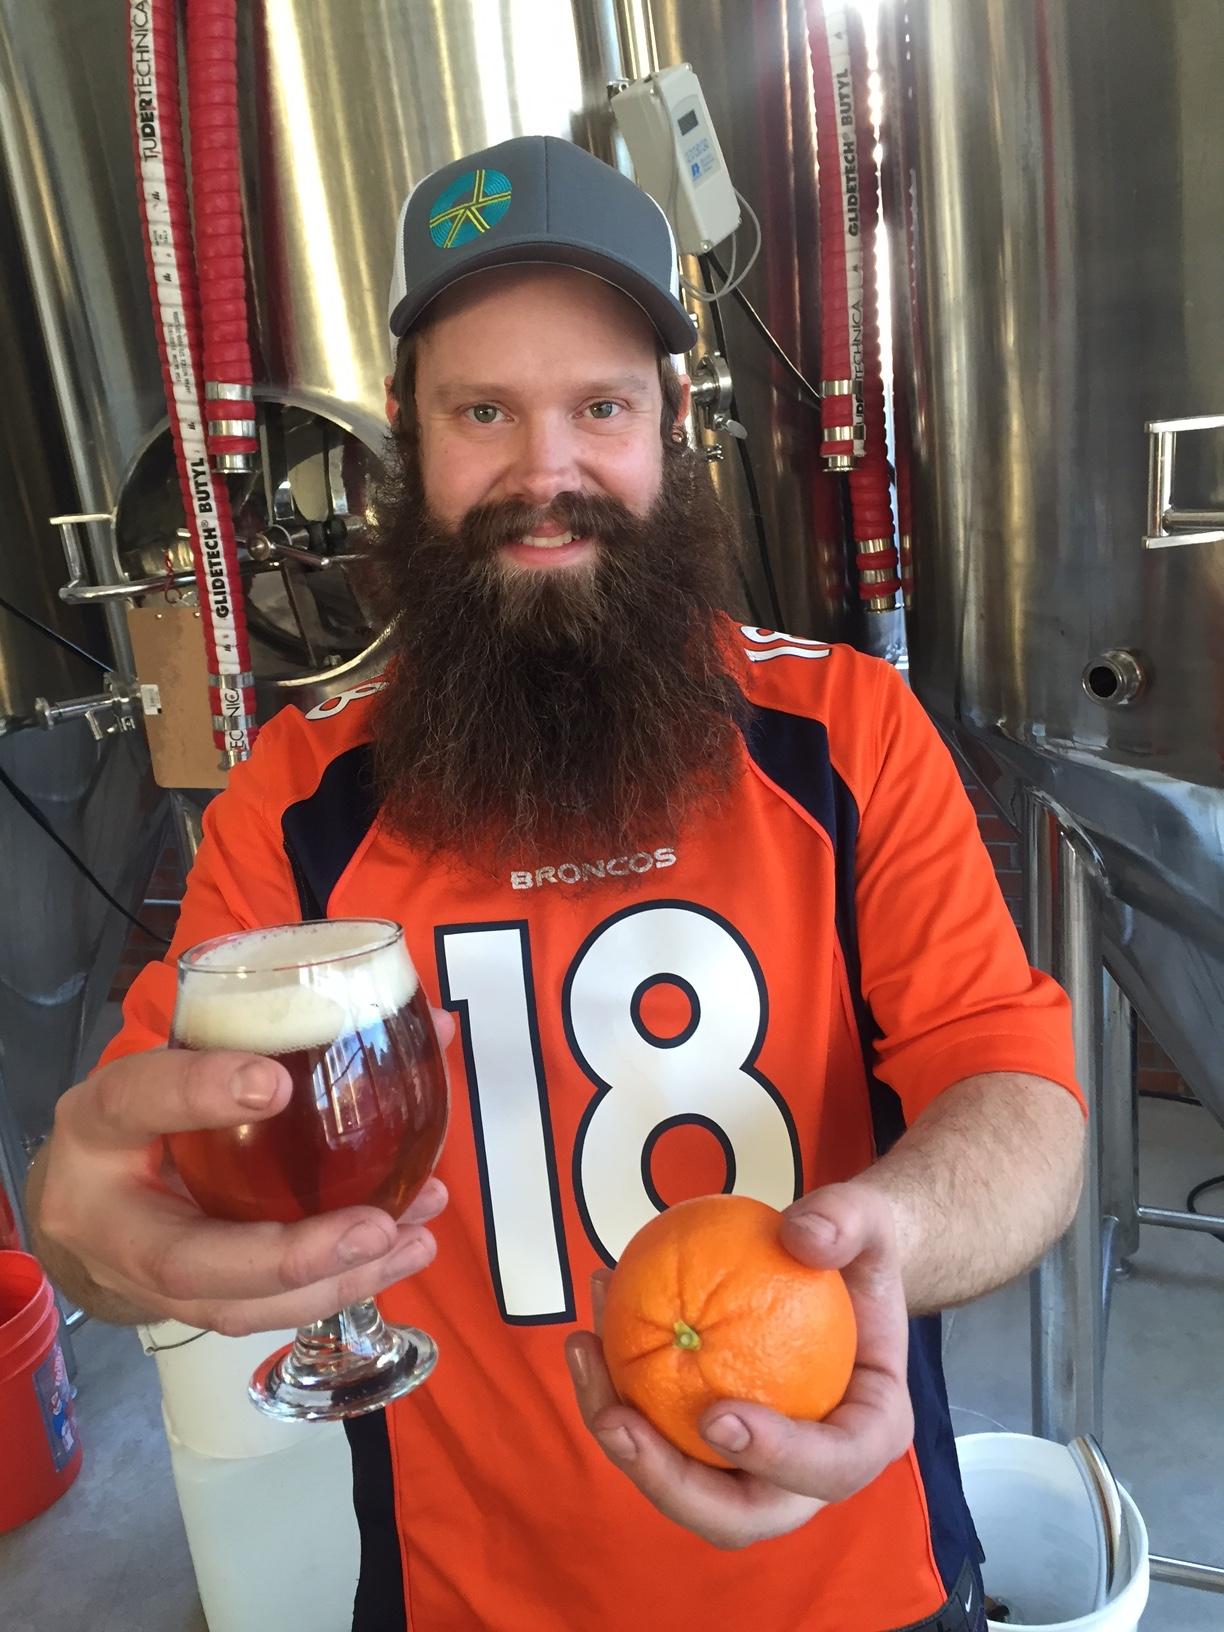 Spangalang brewer Austin Wiley preparing the orange crushsicle